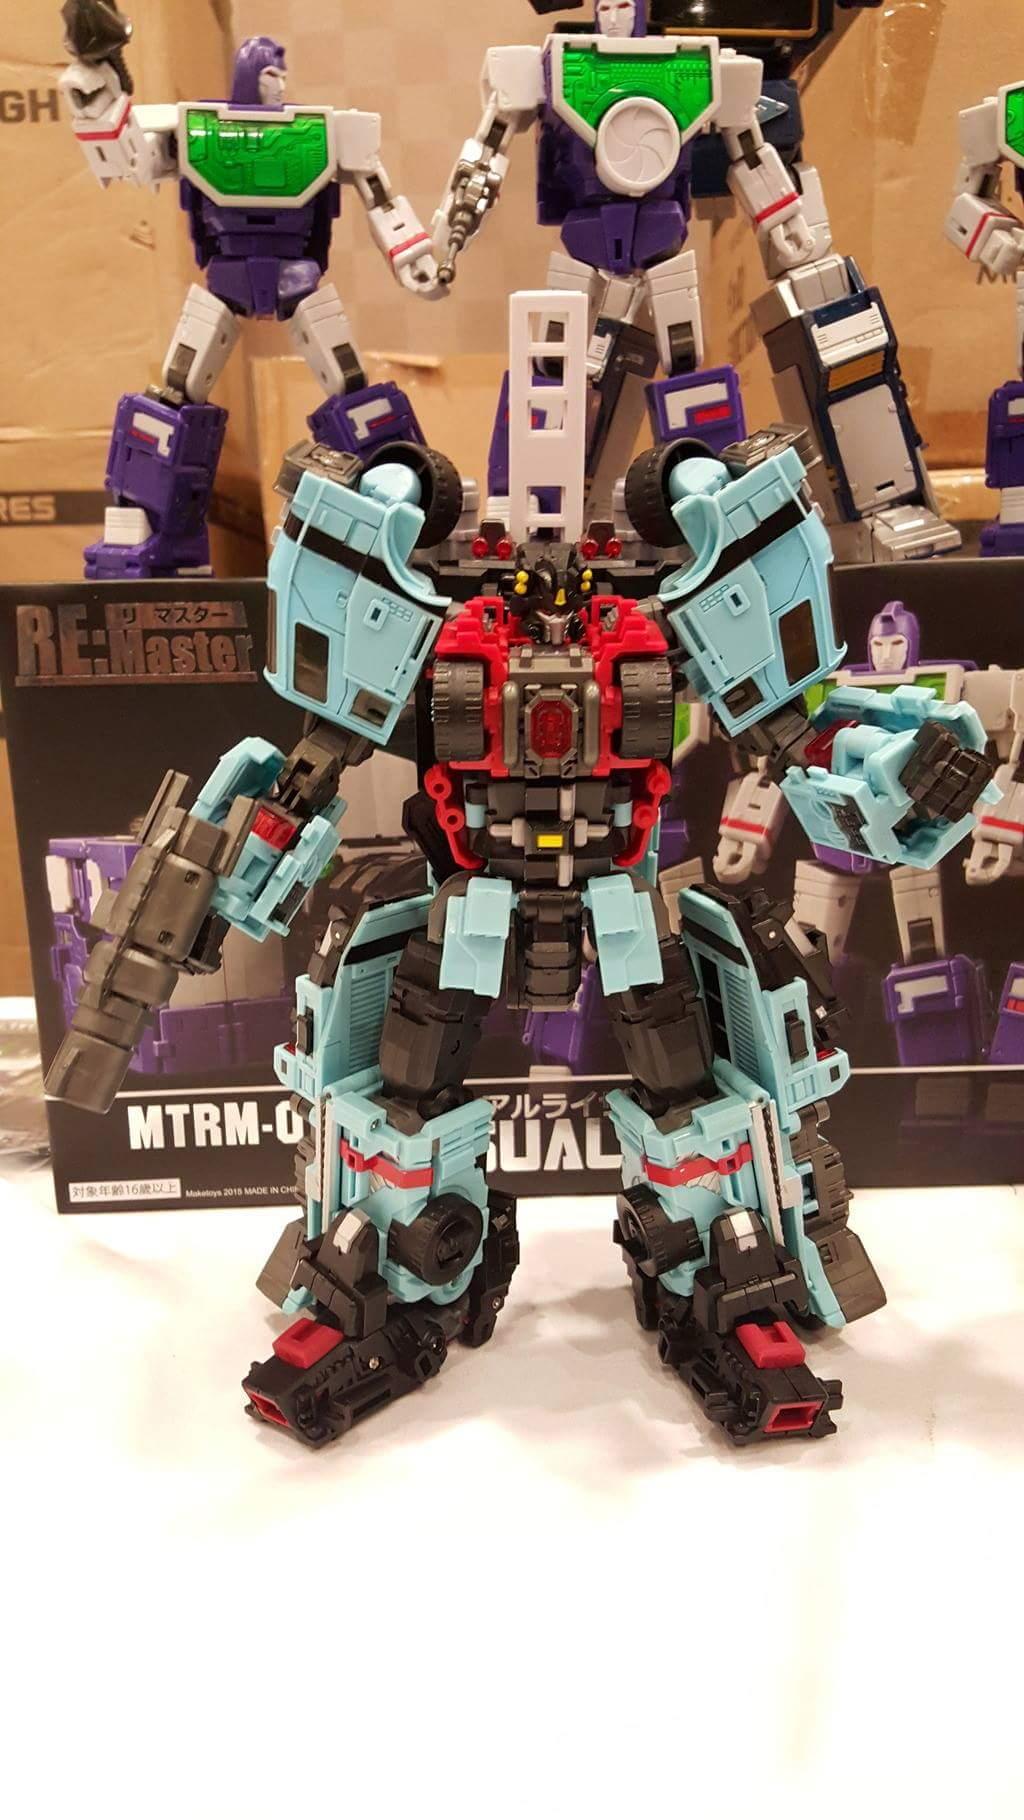 [MakeToys] Produit Tiers - Jouet MTCM-04 Guardia (aka Protectobots - Defensor/Defenso) ExWB0Vld